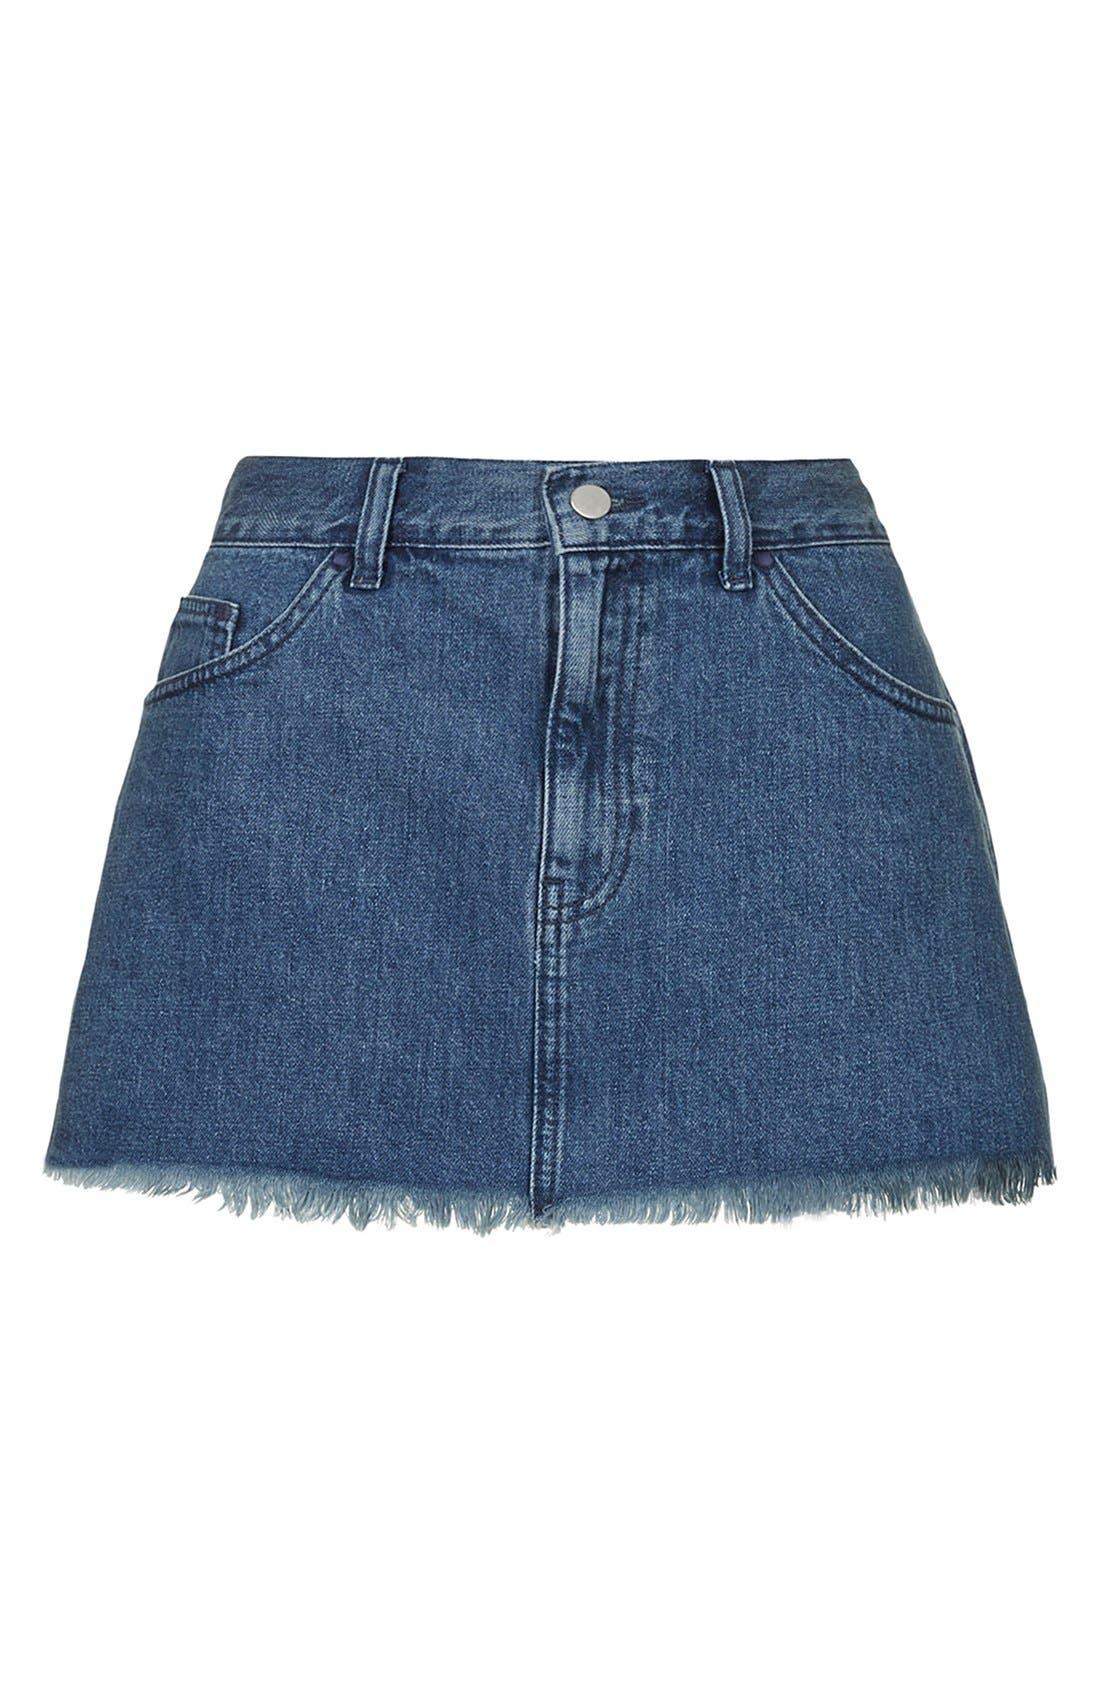 Alternate Image 4  - Marques'Almeida for Topshop Denim Miniskirt